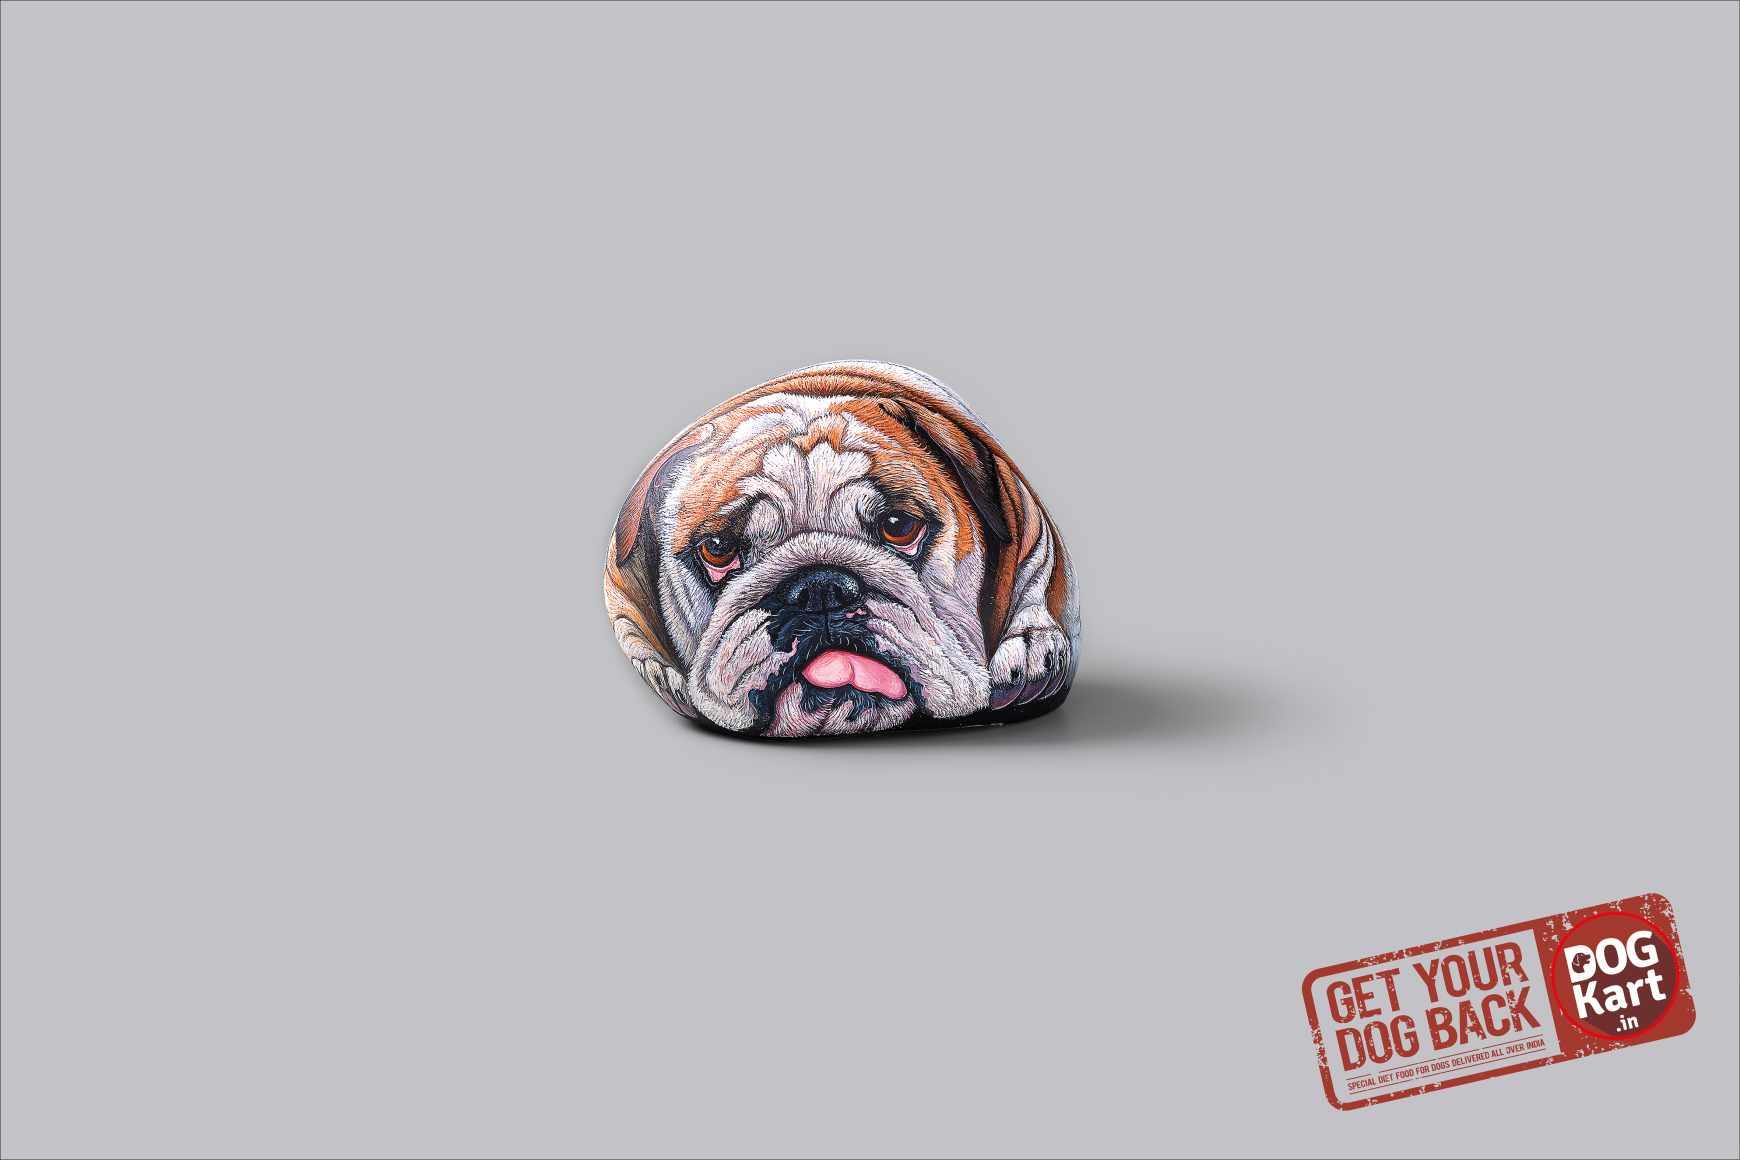 Dogkart Print Ad - Rock Heavy - Heavy Bulldog